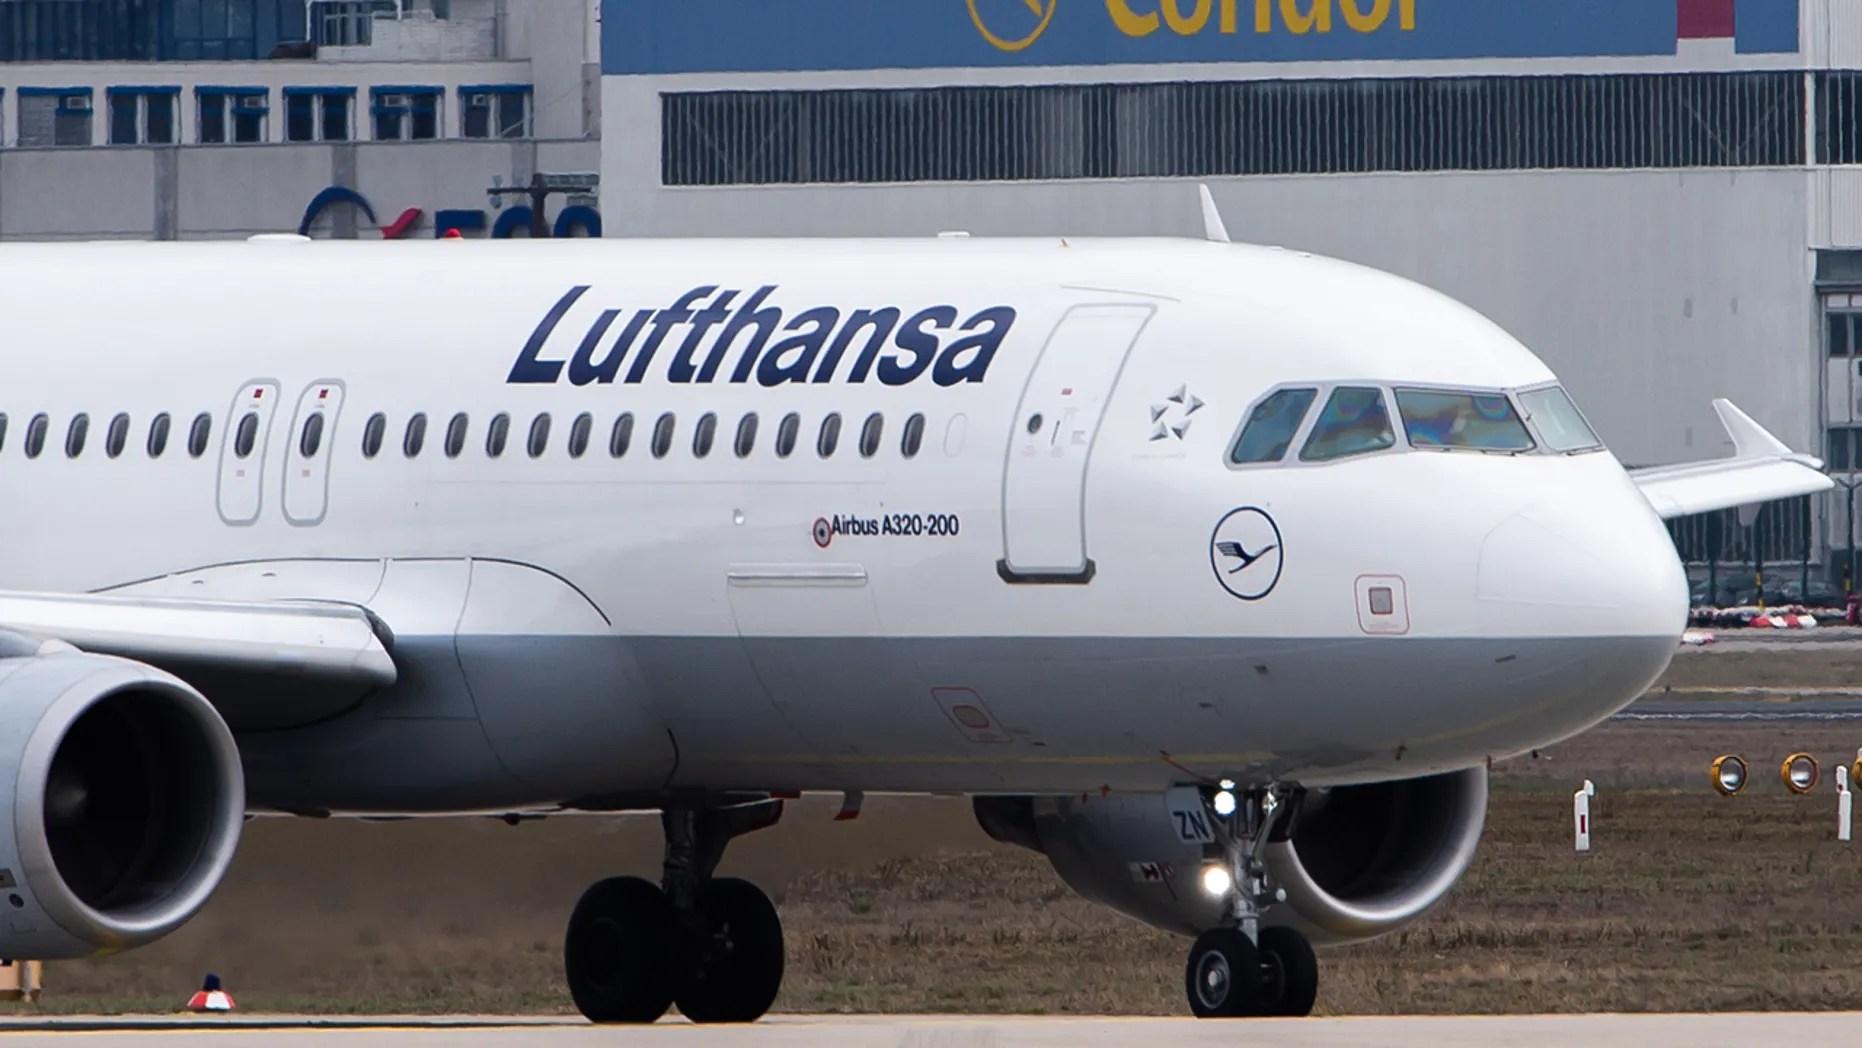 lufthansa comes after passenger